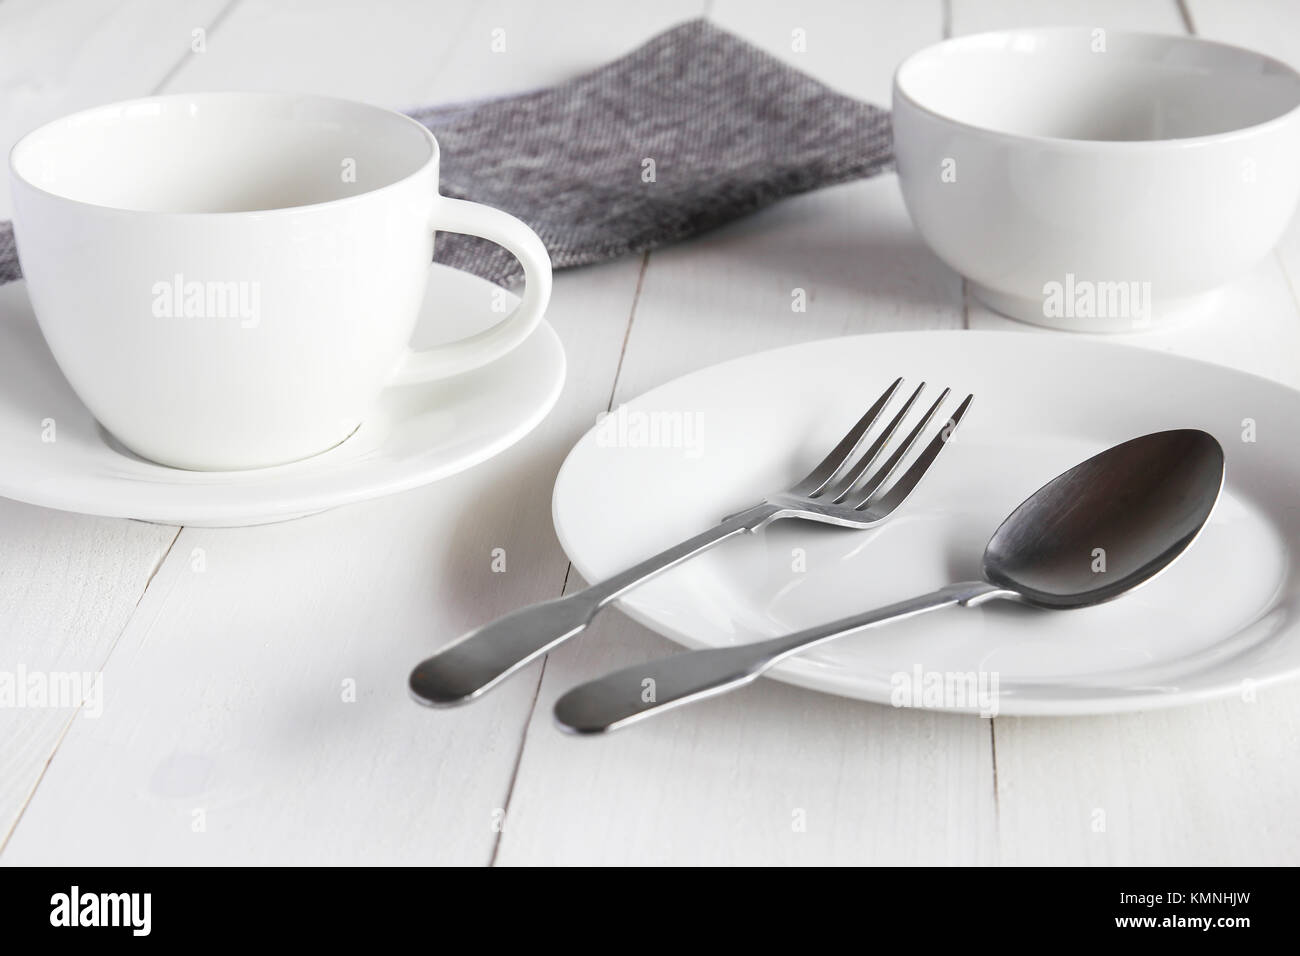 Design concept of mockup various kitchenware utensils set on white ...